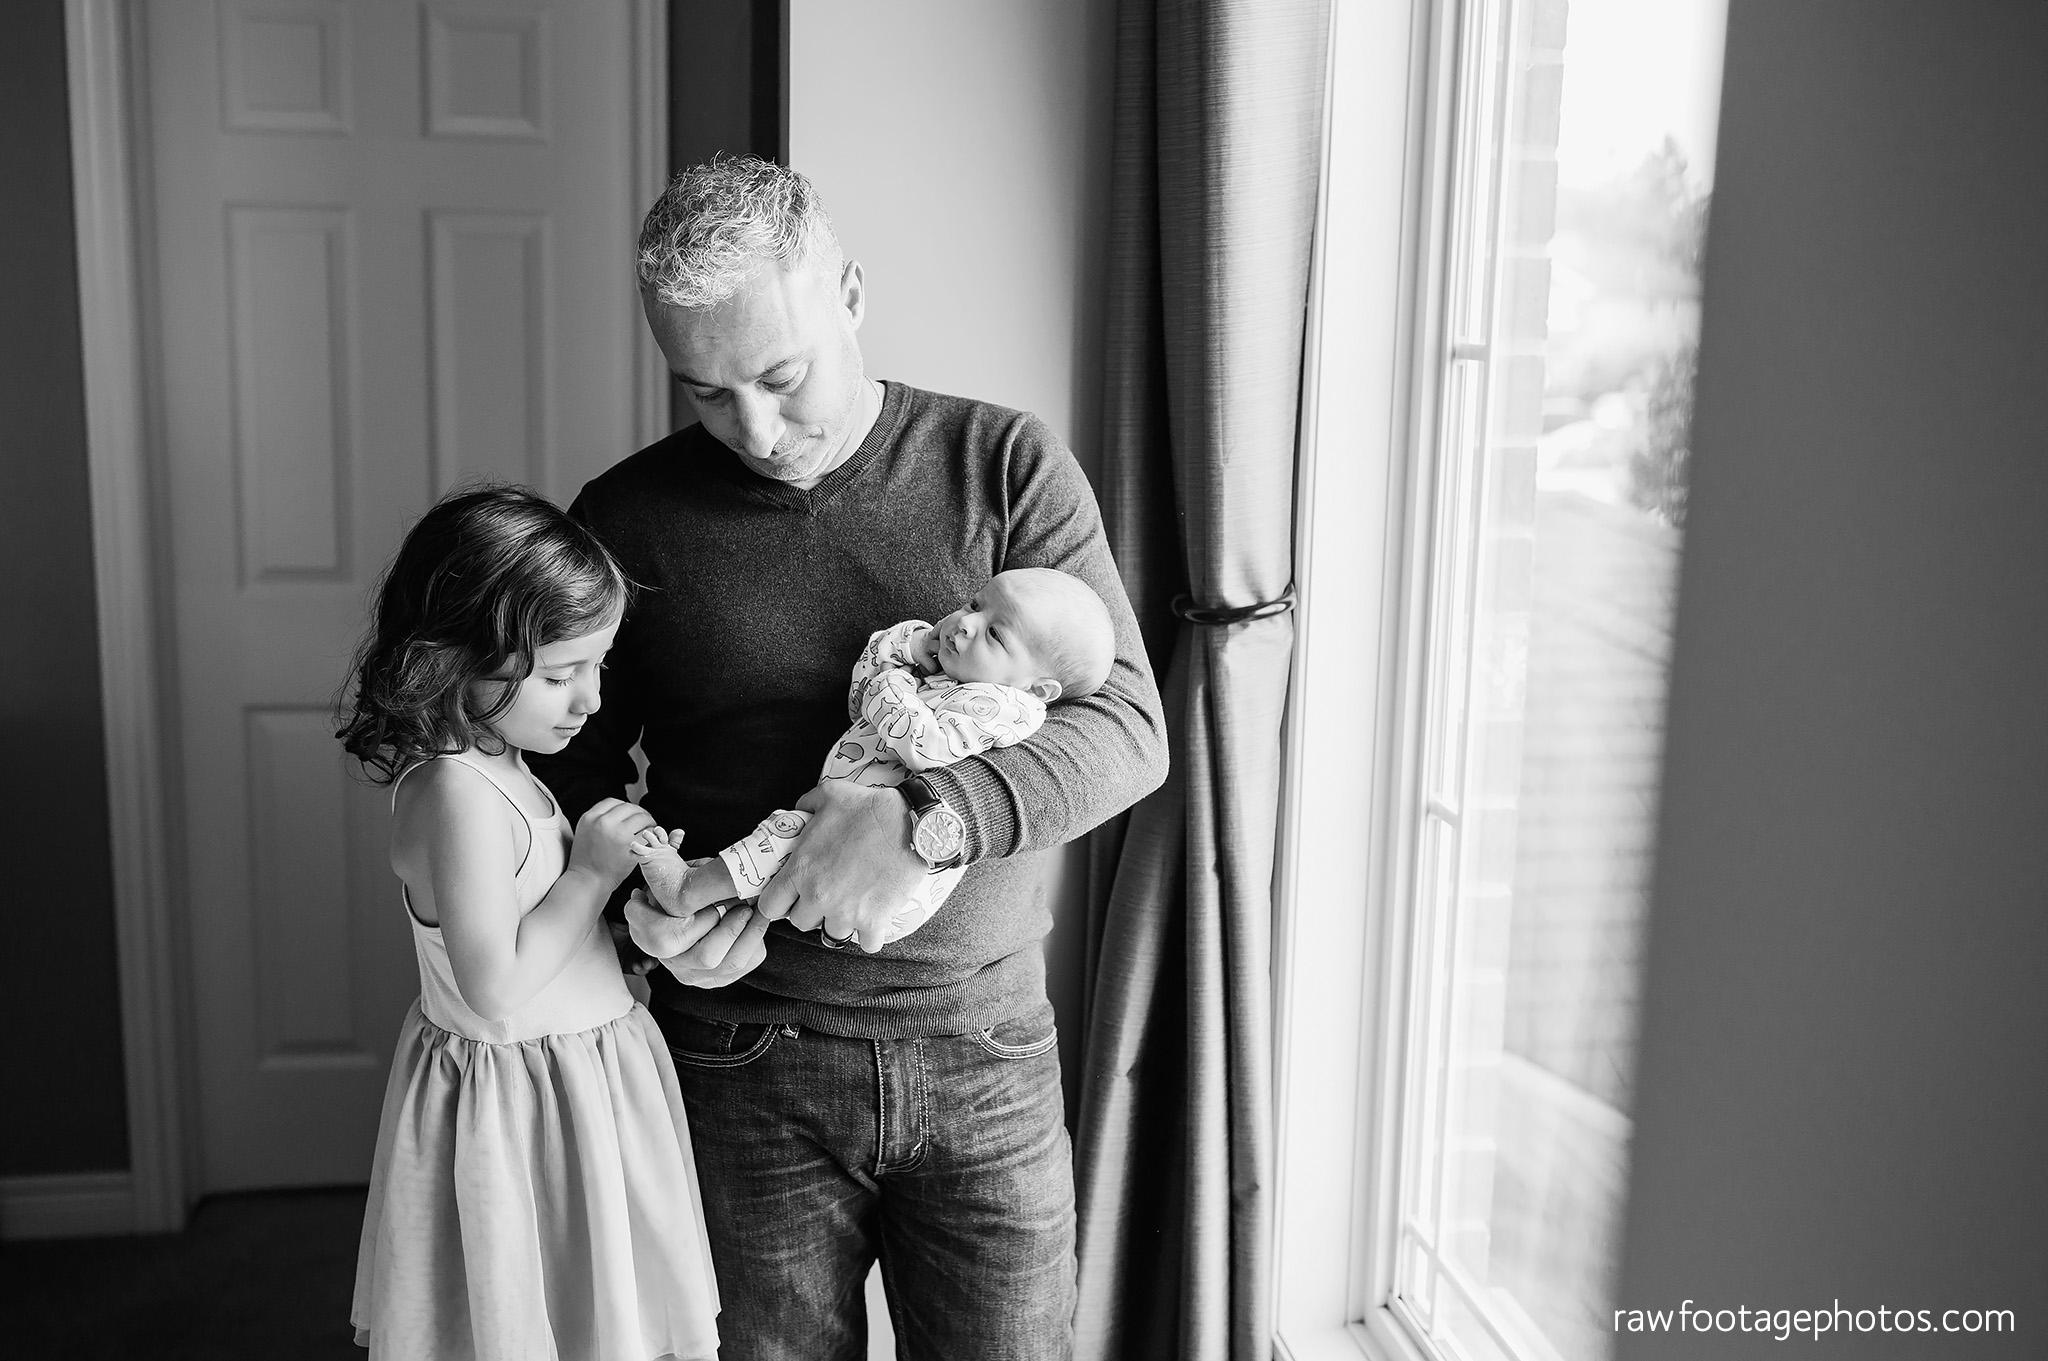 london_ontario_newborn_lifestyle_photographer-baby_nate-raw_footage_photography024.jpg